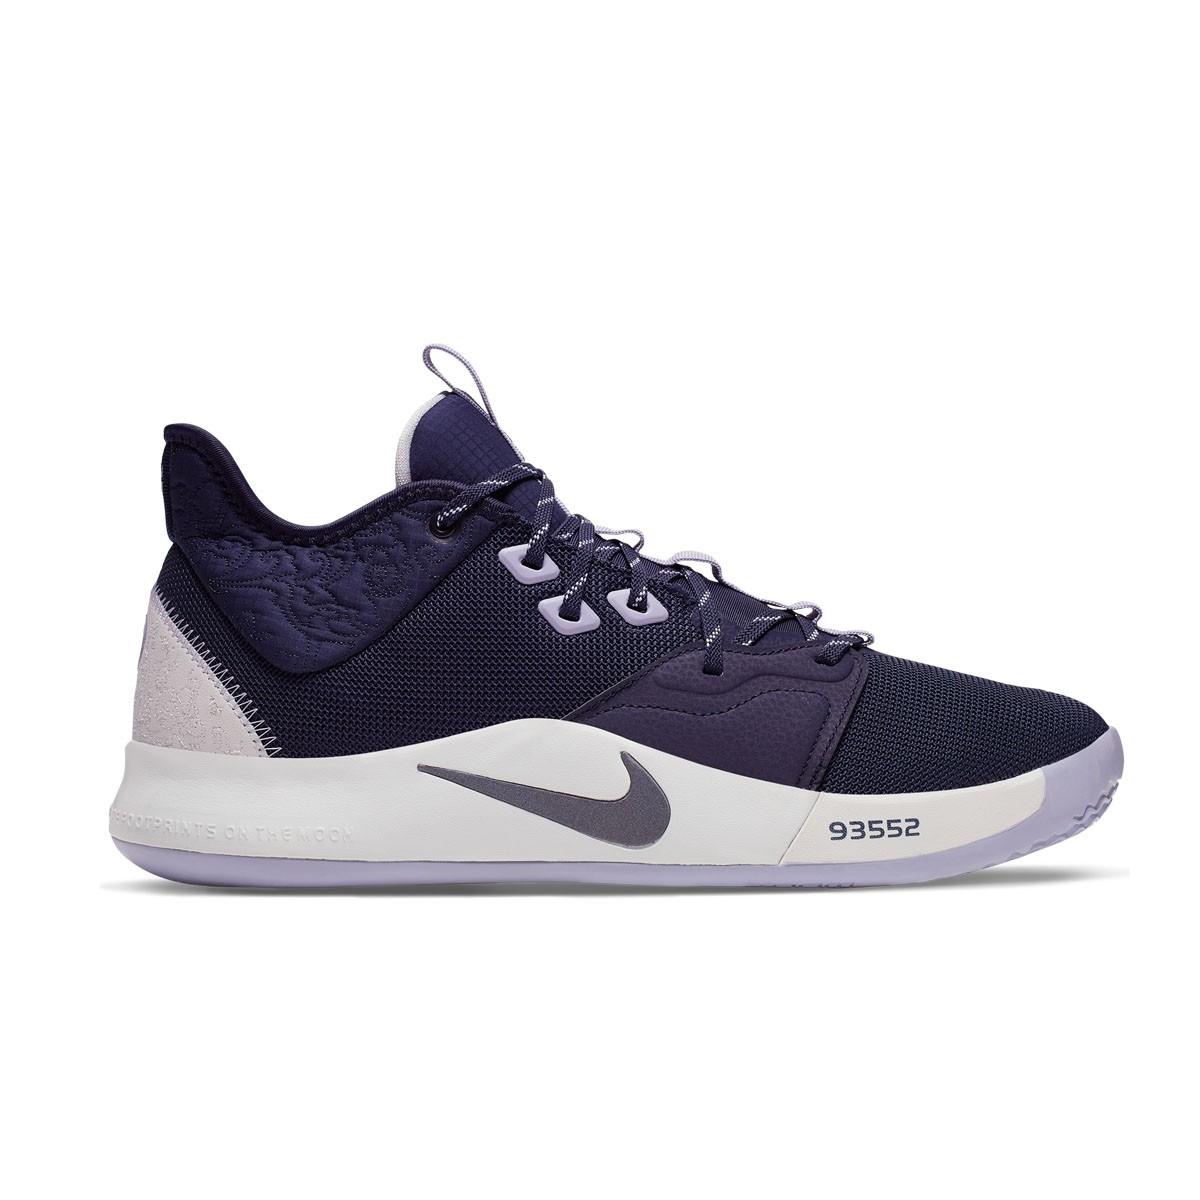 new concept 66325 d2c4e Nike PG 3 'Paulette'